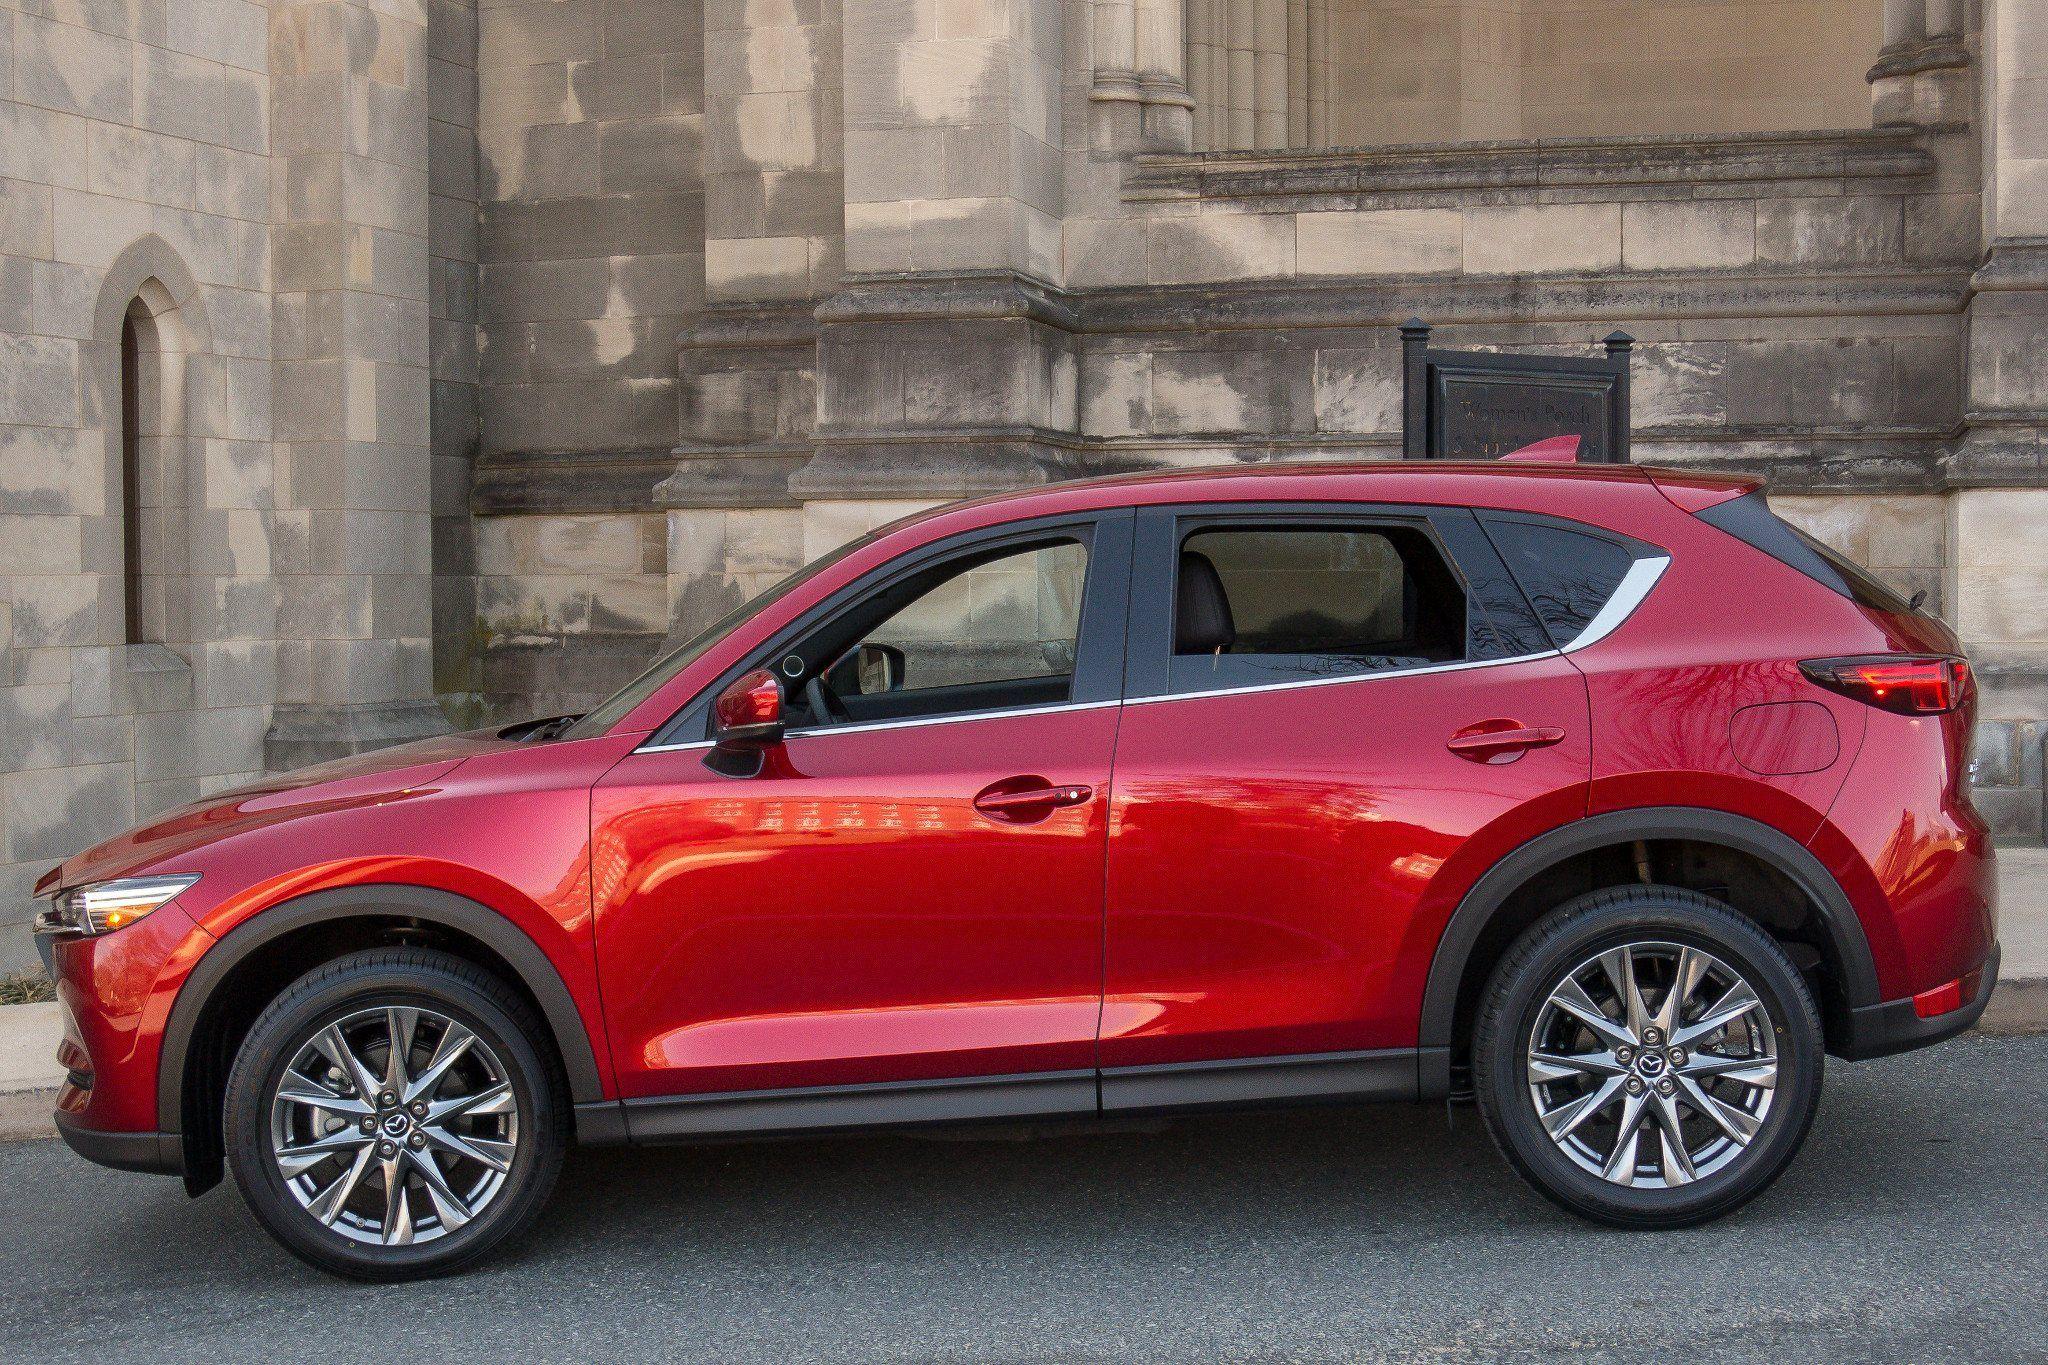 2020 New toyota Wish Engine in 2020 | Mazda, Compact suv